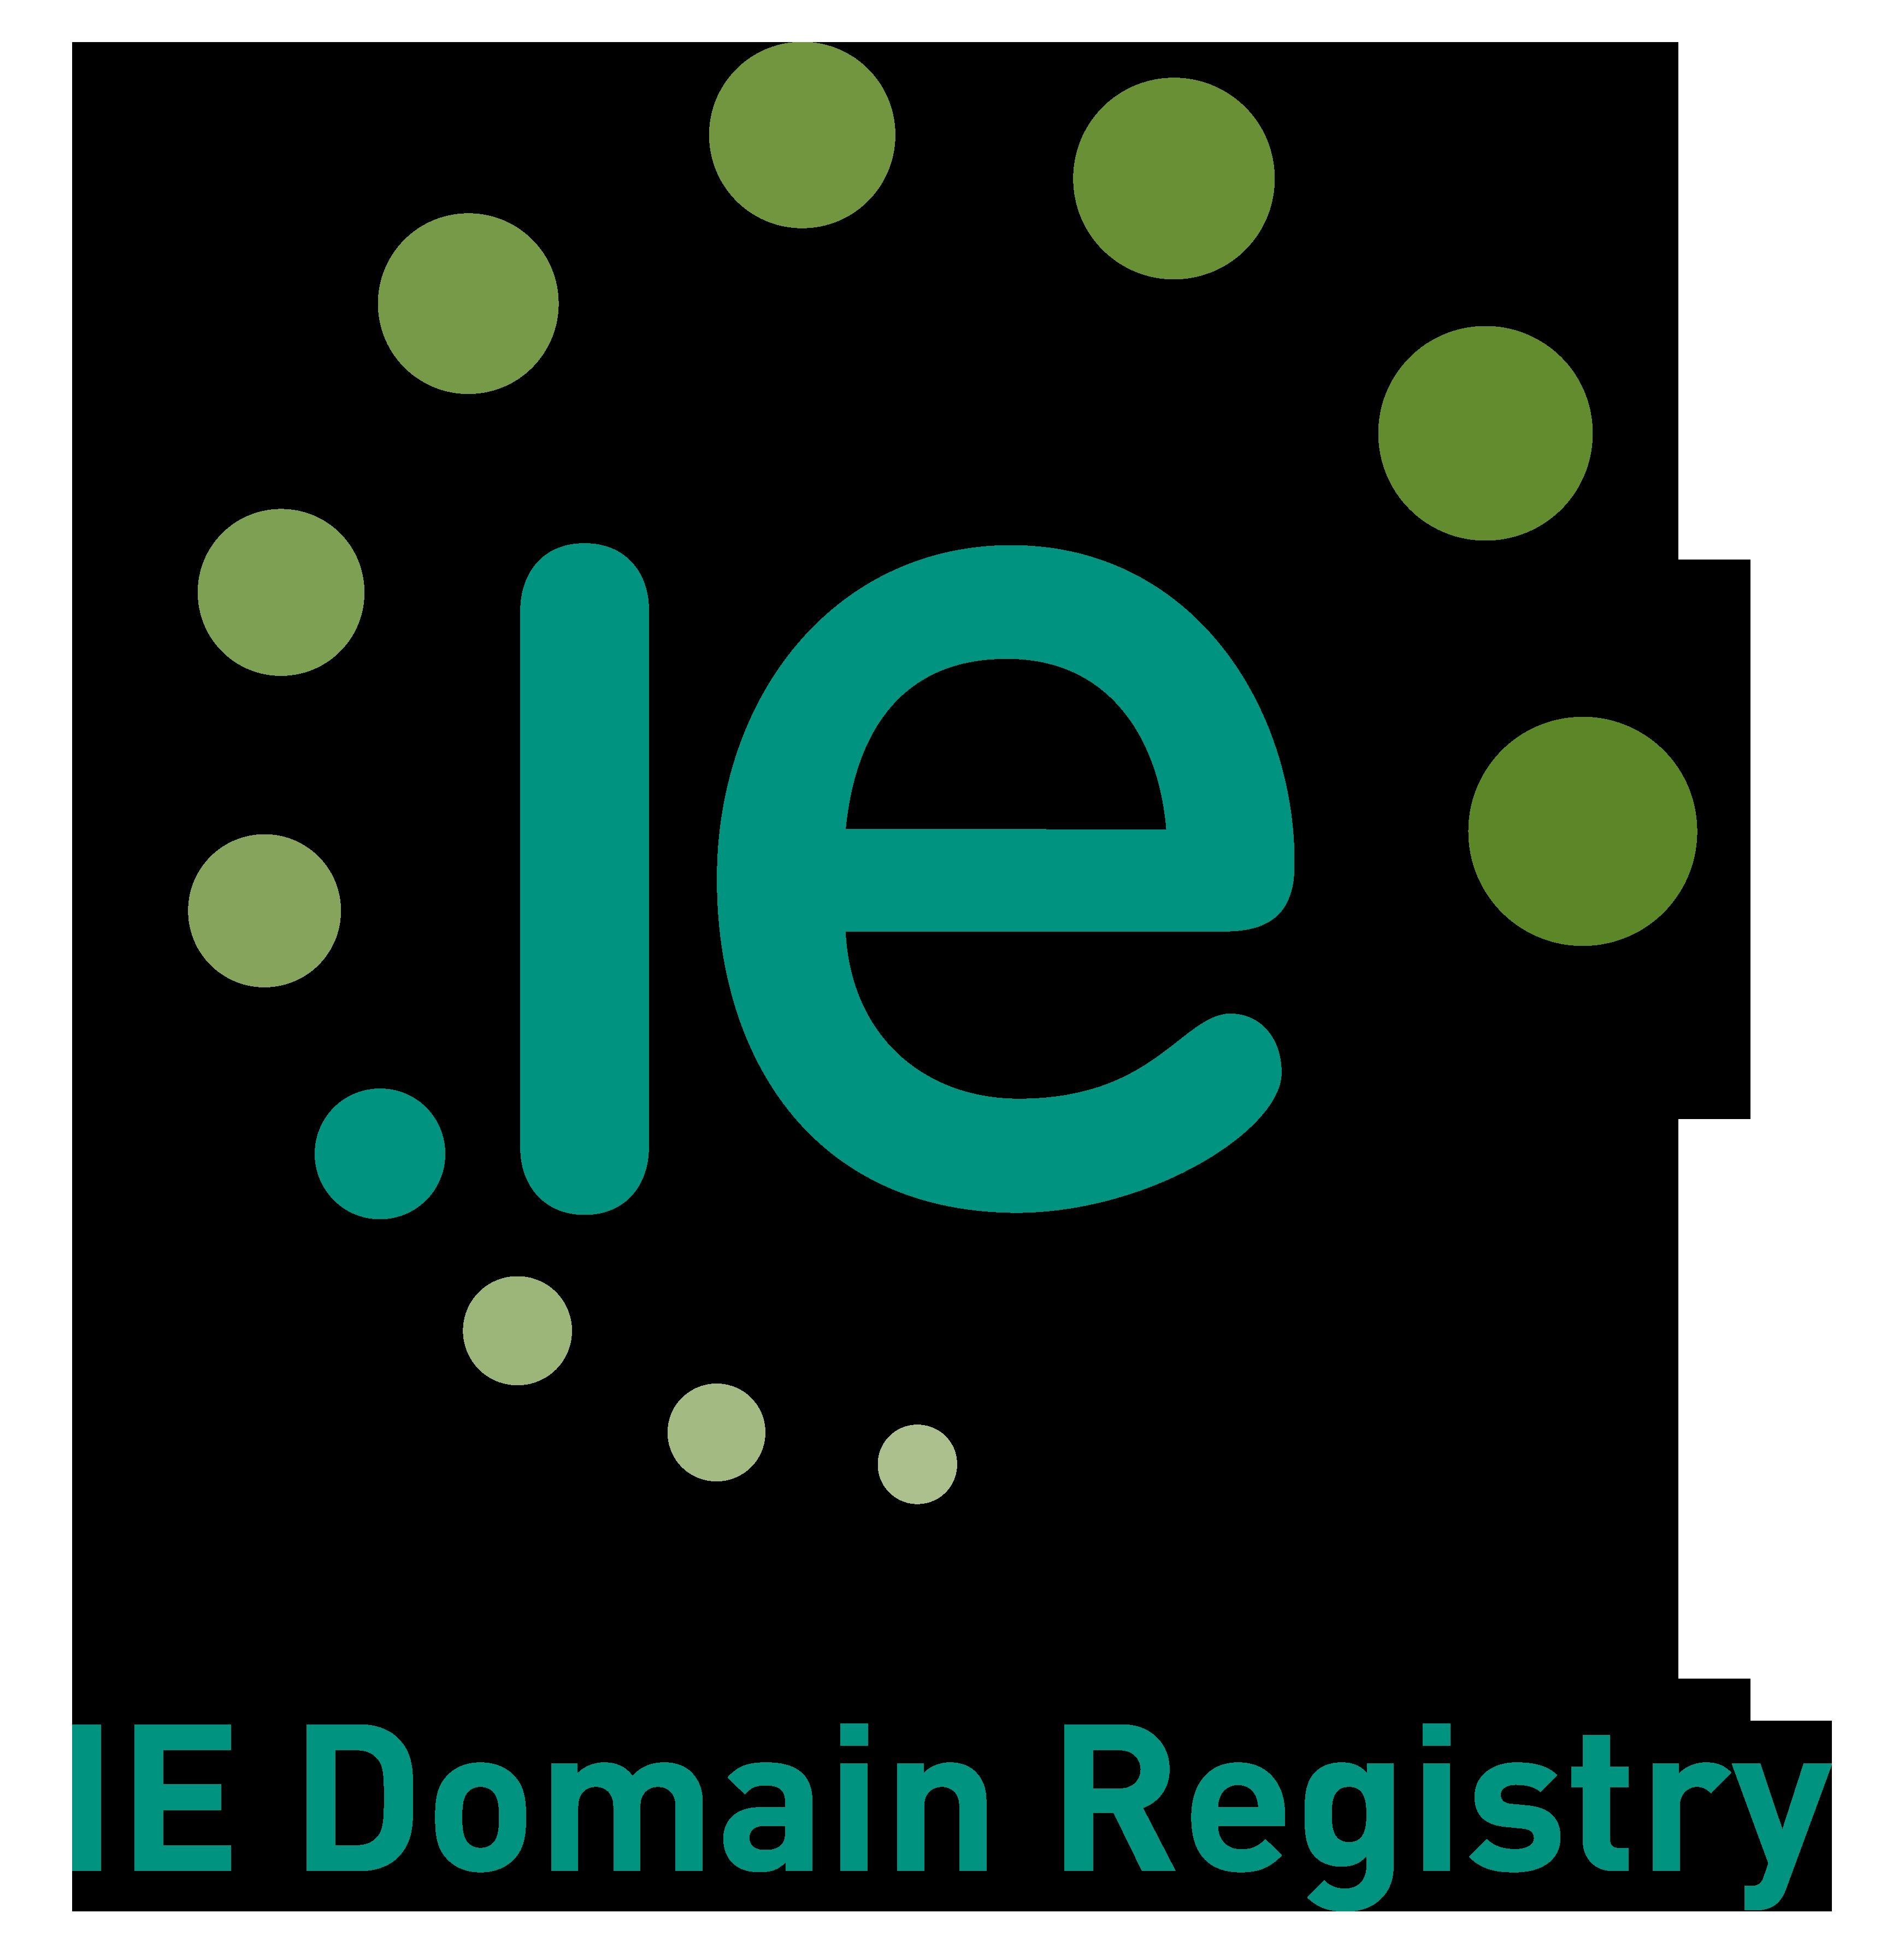 How to Become a Domain Registrar